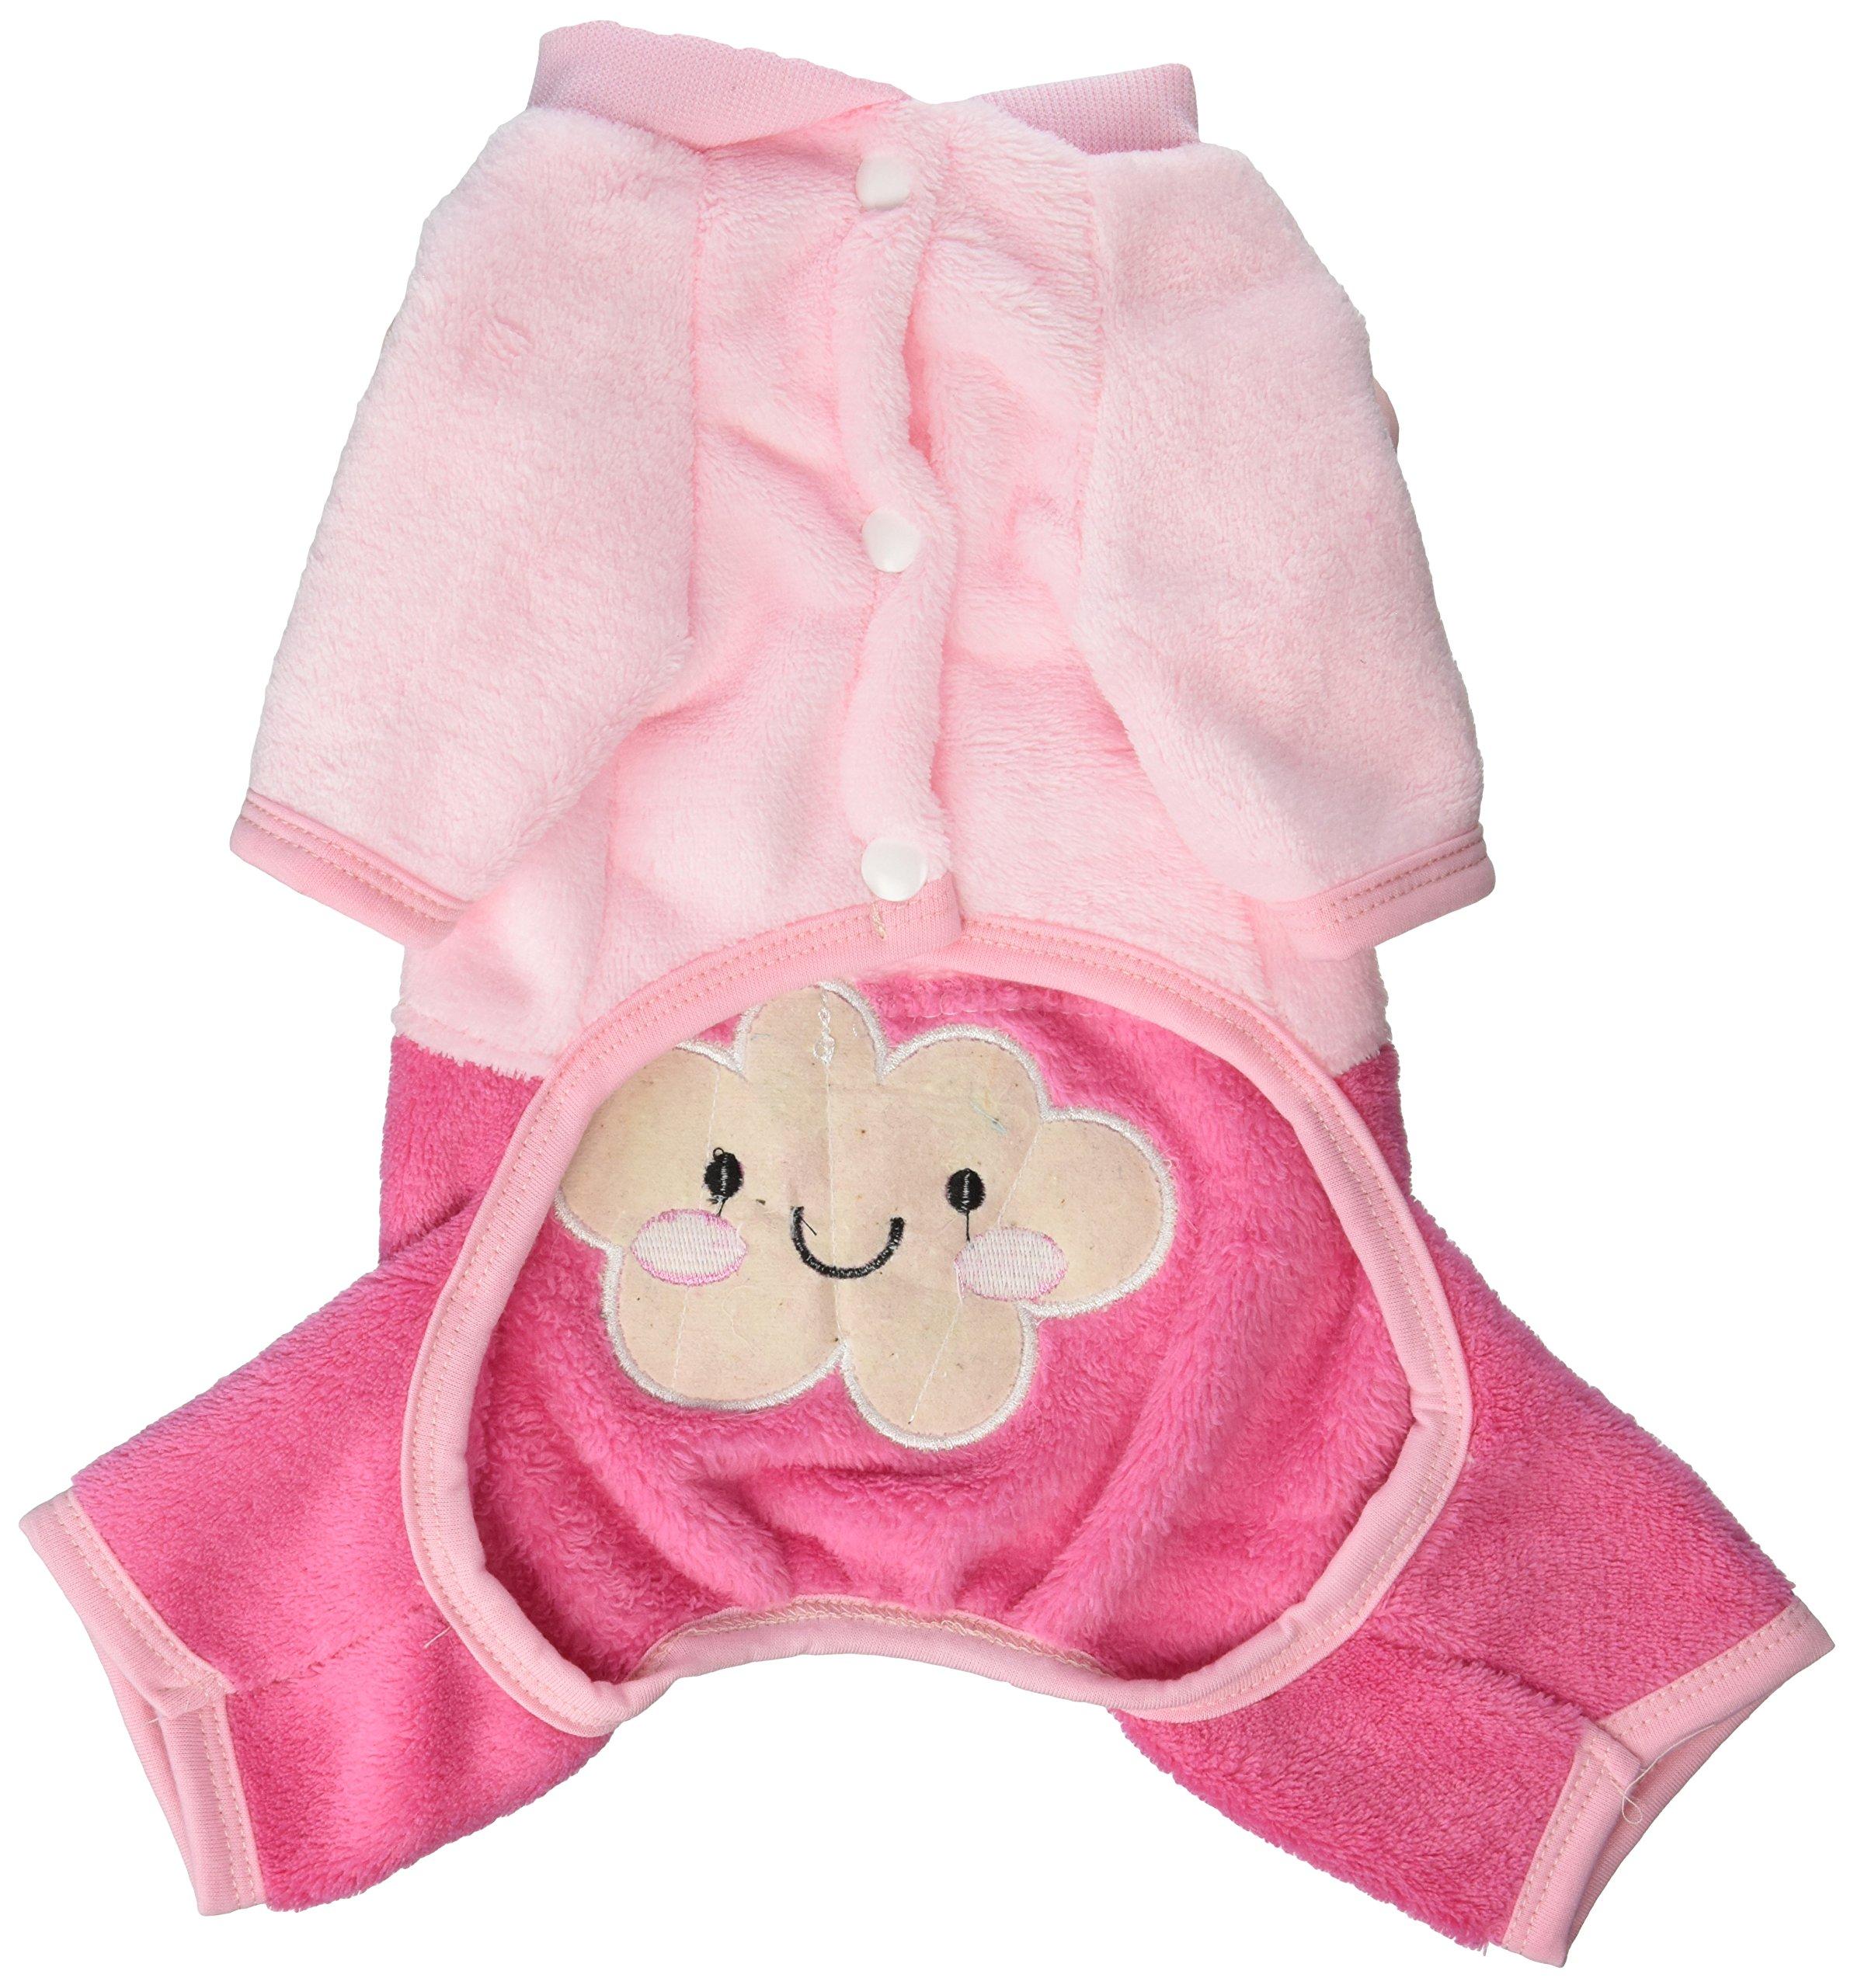 SMALLLEE_LUCKY_STORE Pet Cloud Bear Four Legs Velvet Coat, Pink, Medium